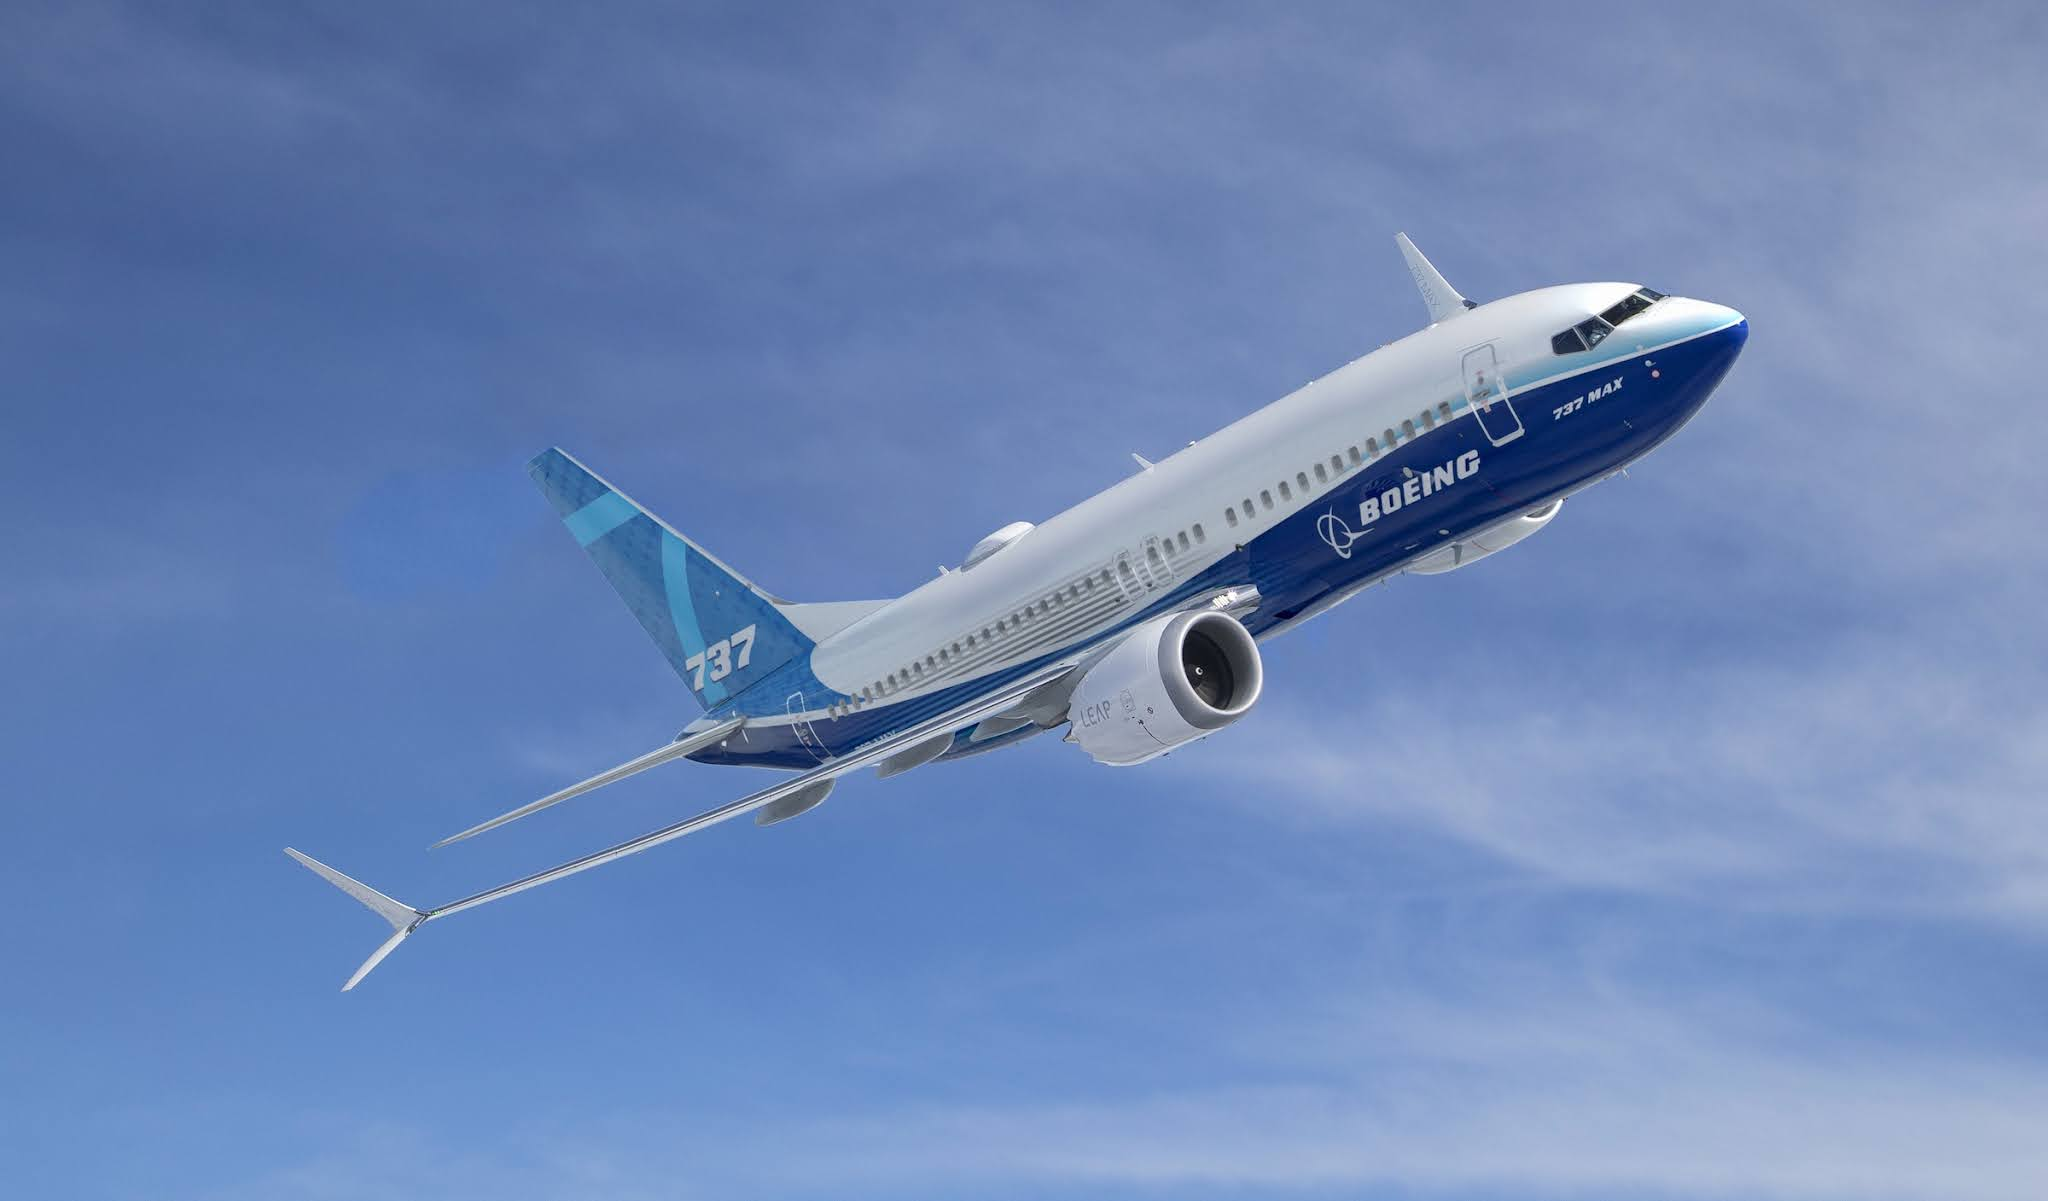 DAE orders 15 Boeing 737 MAX airplanes worth $1.8 billion